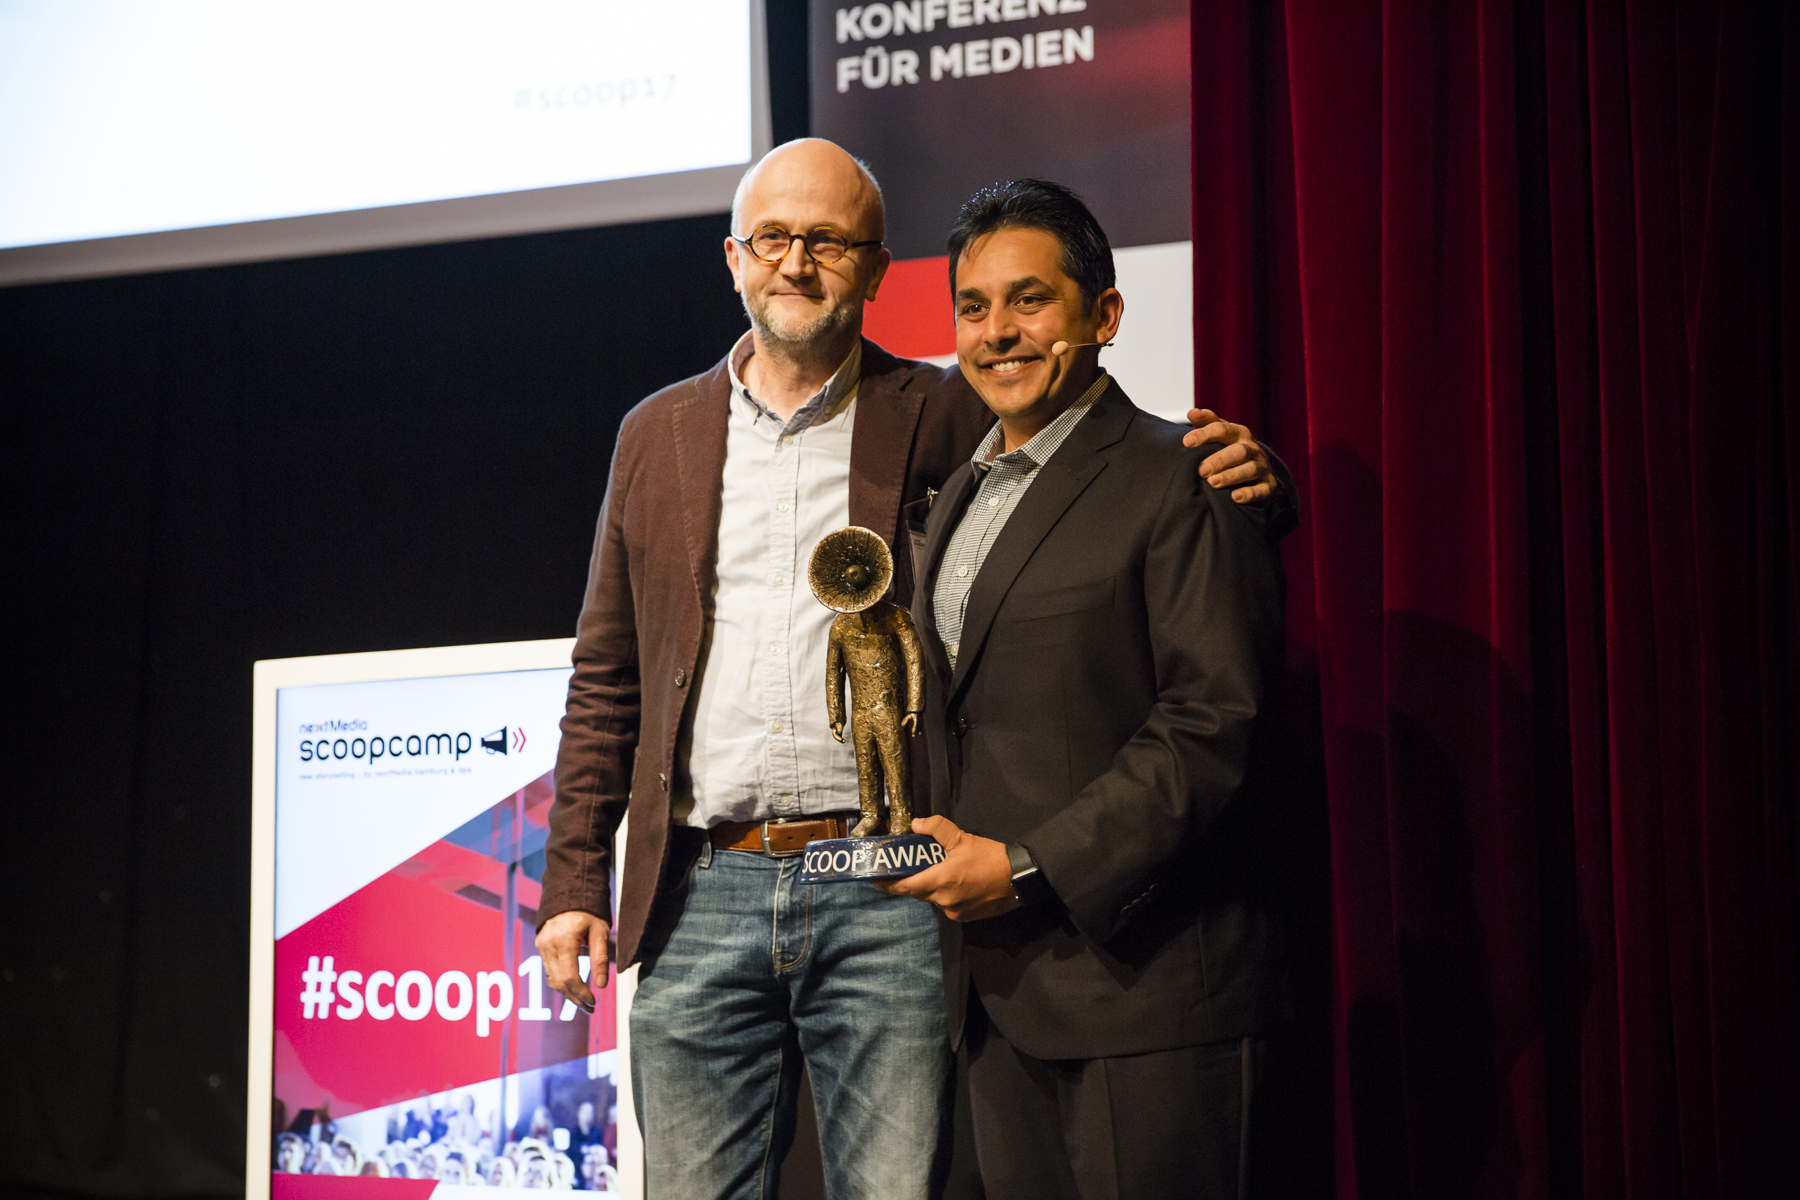 Übergabe scoop Award Meinof Ellers (dpa) & Jigar Mehta (Fusion Media)